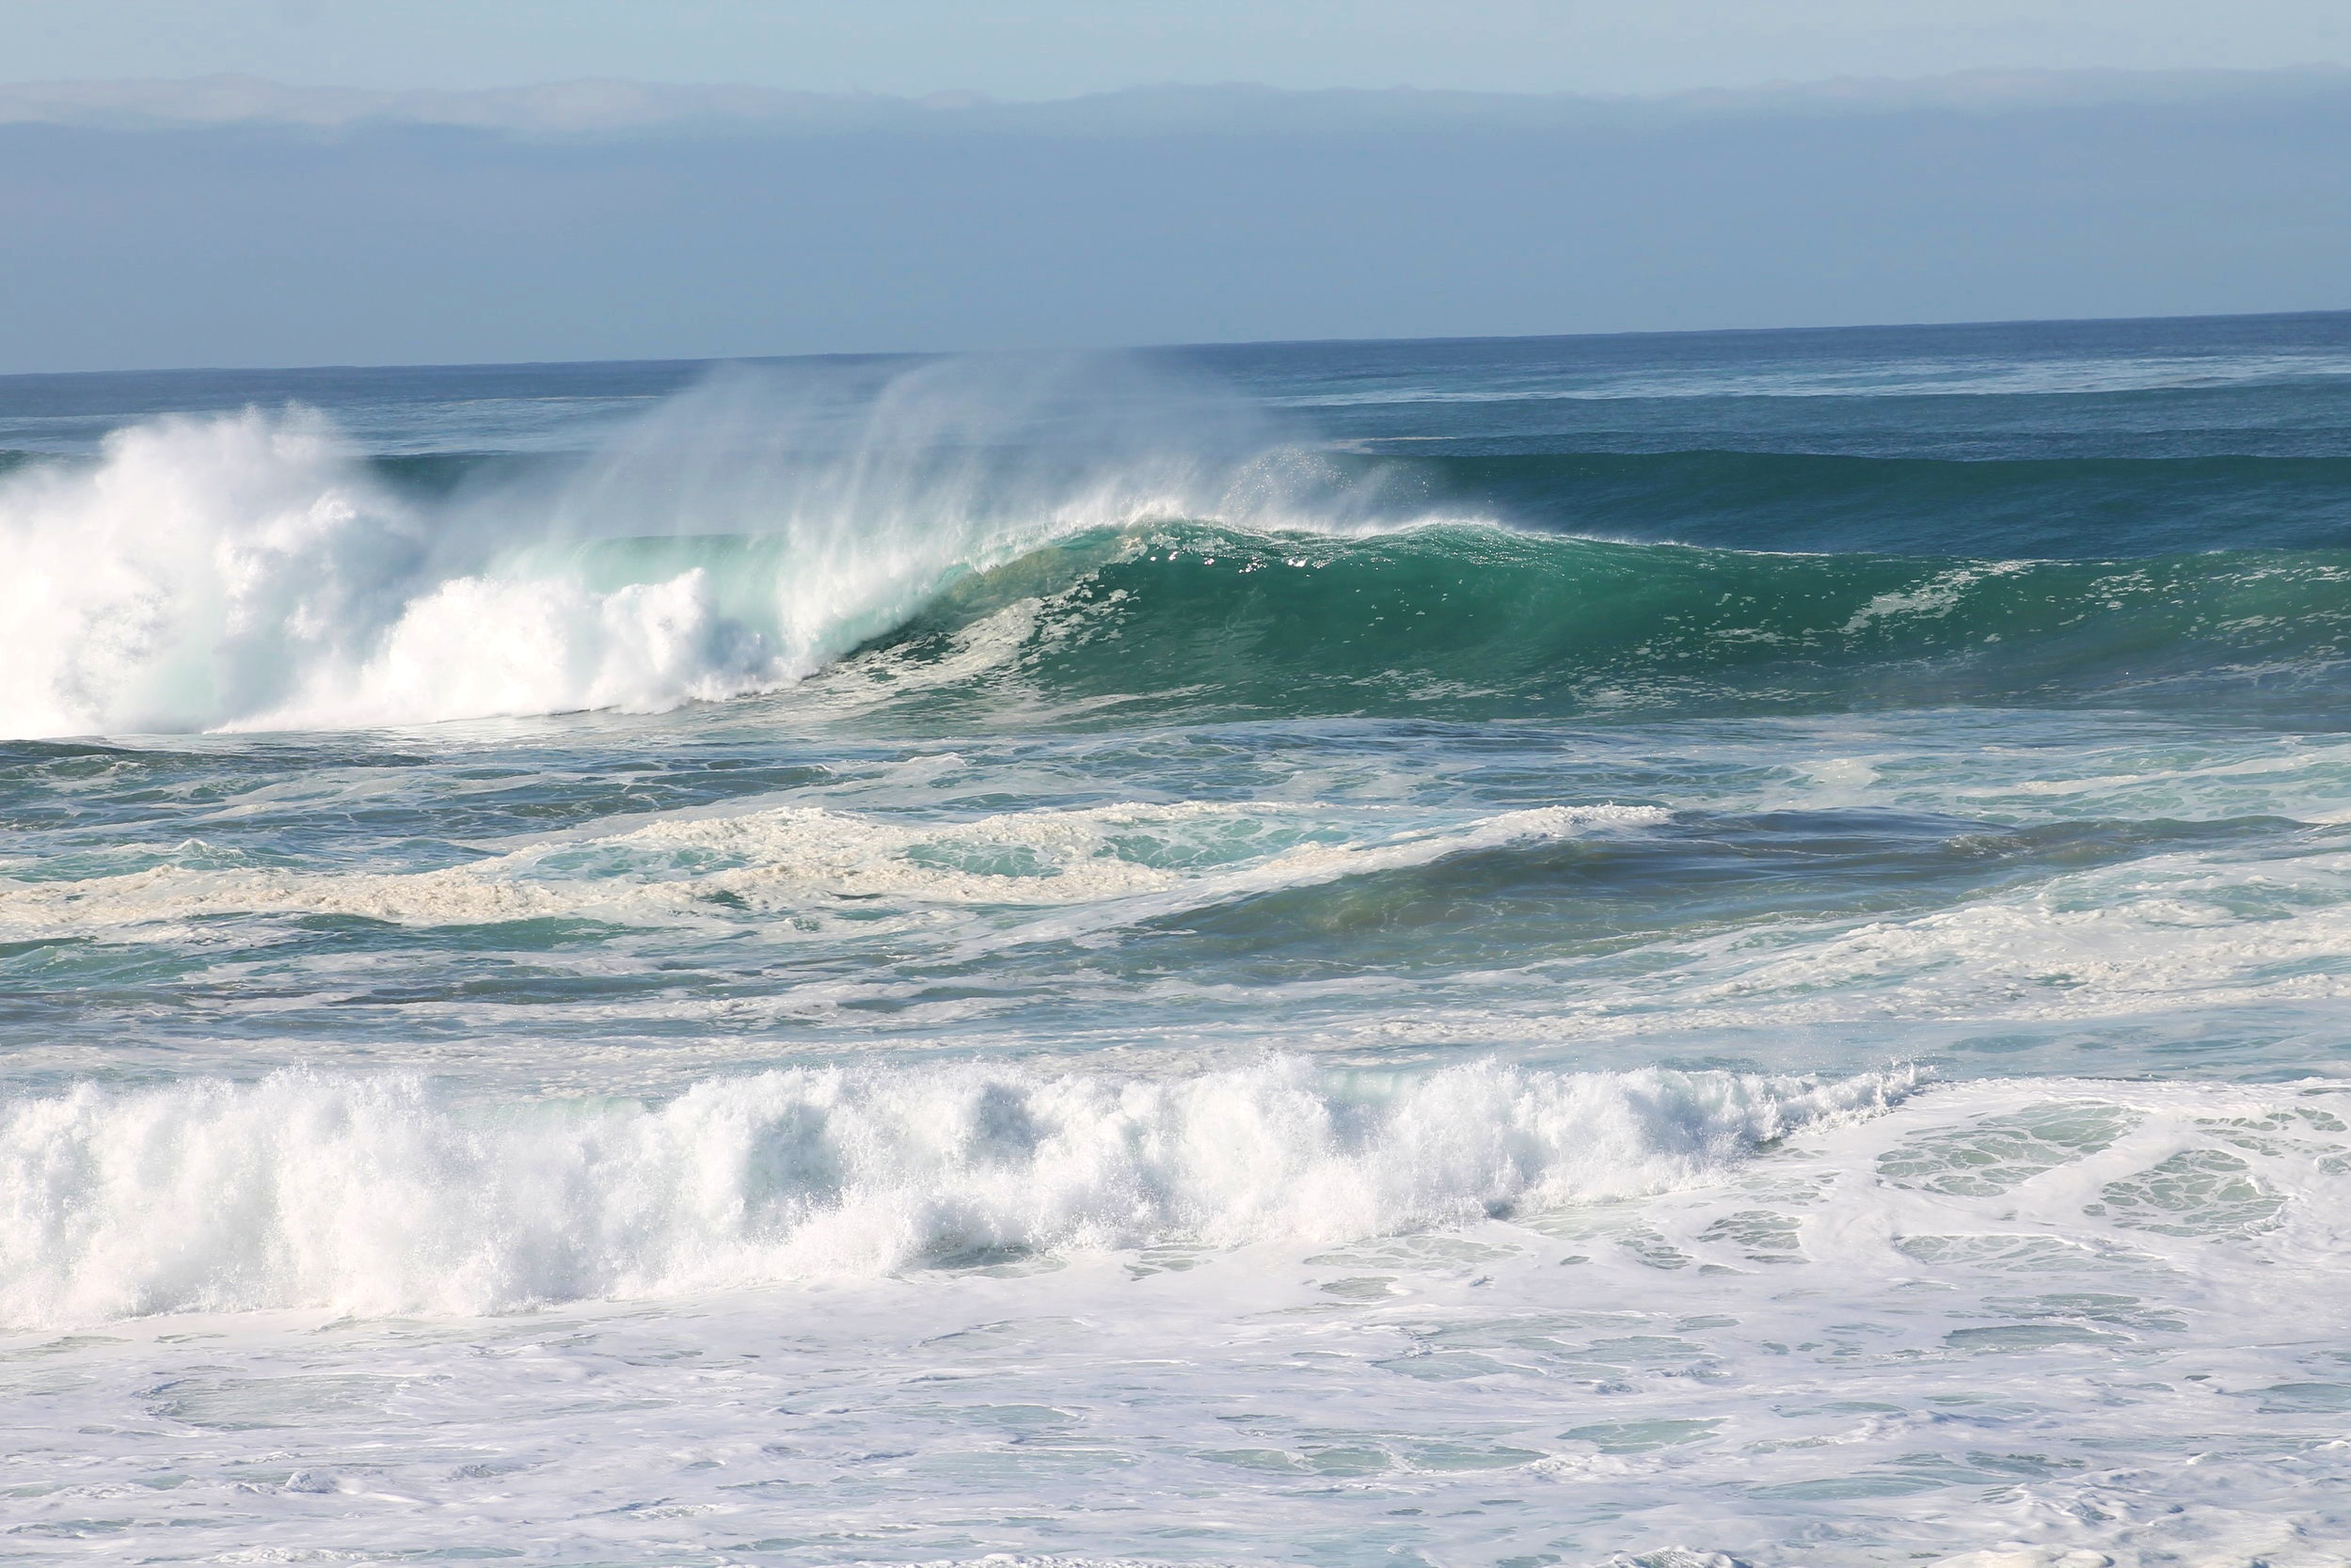 Surfing Fort Bragg